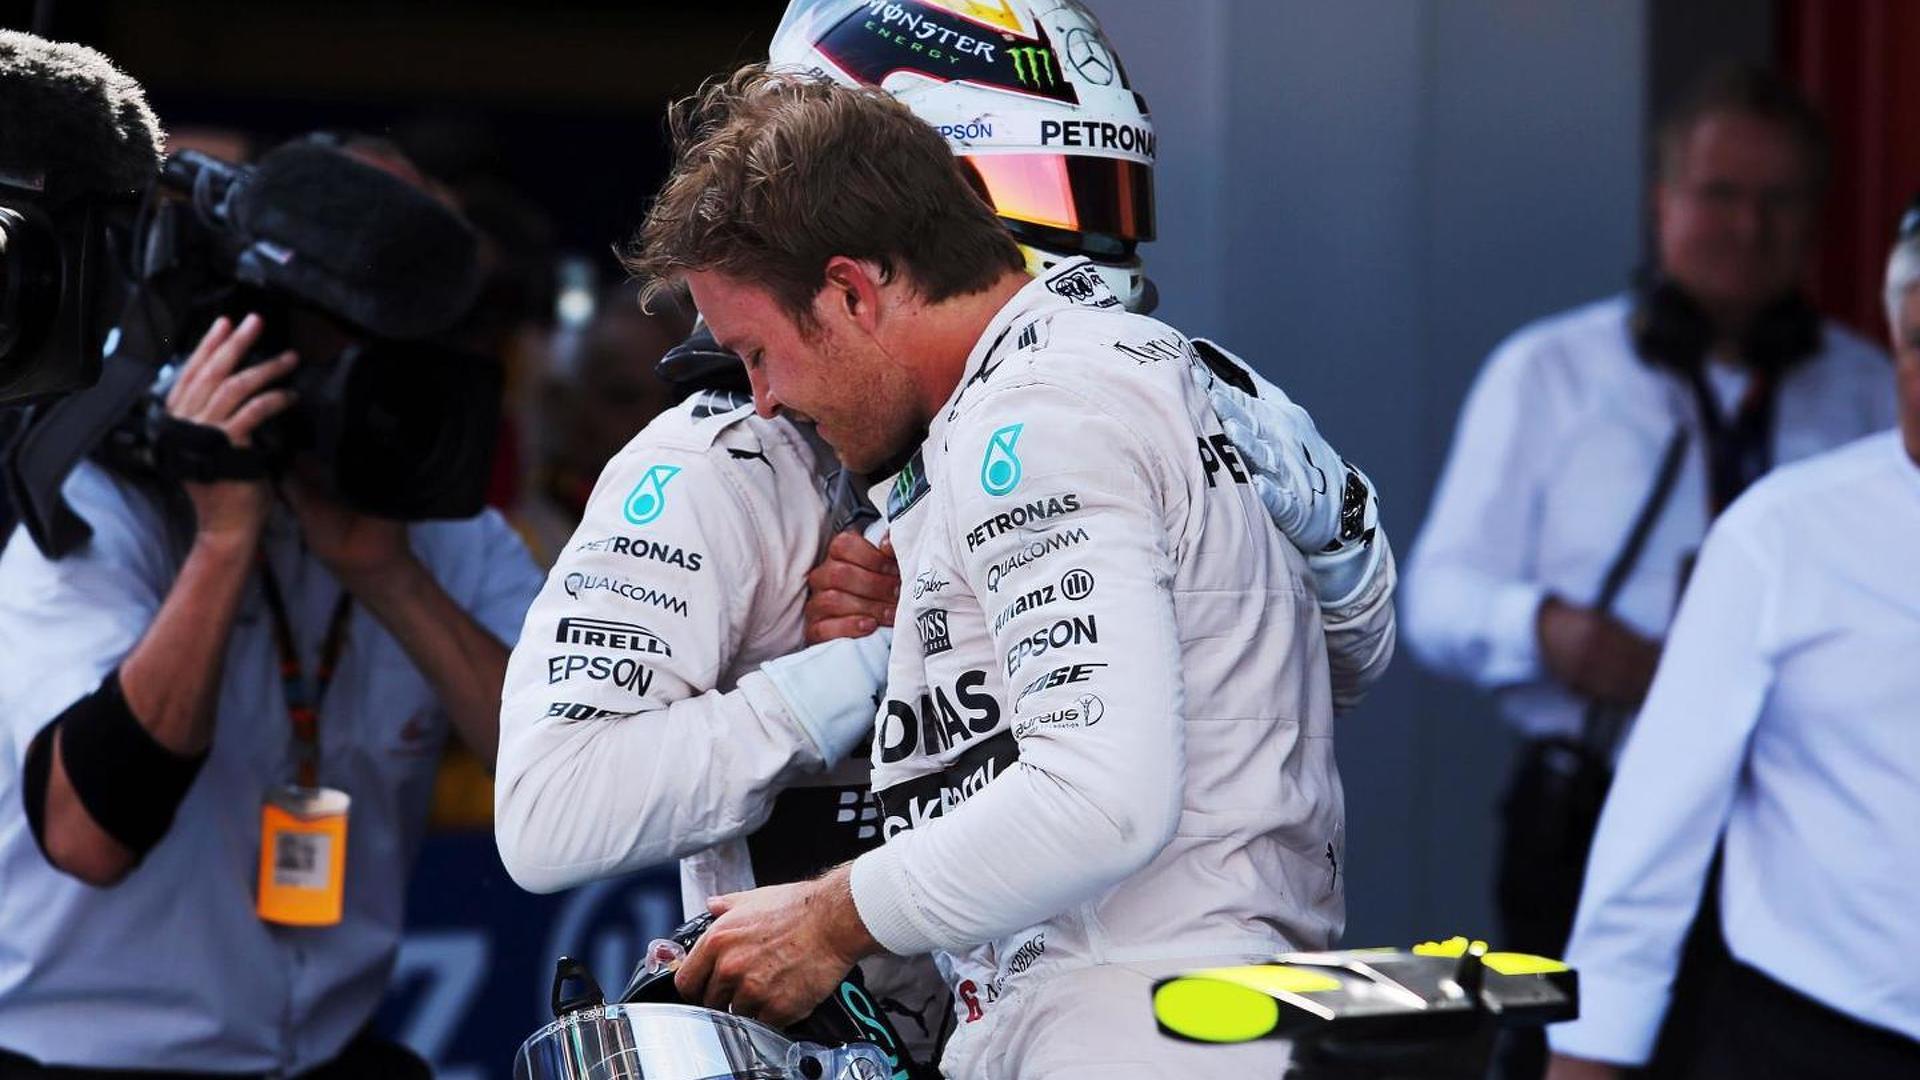 Hamilton 'dominating' Rosberg - Ecclestone